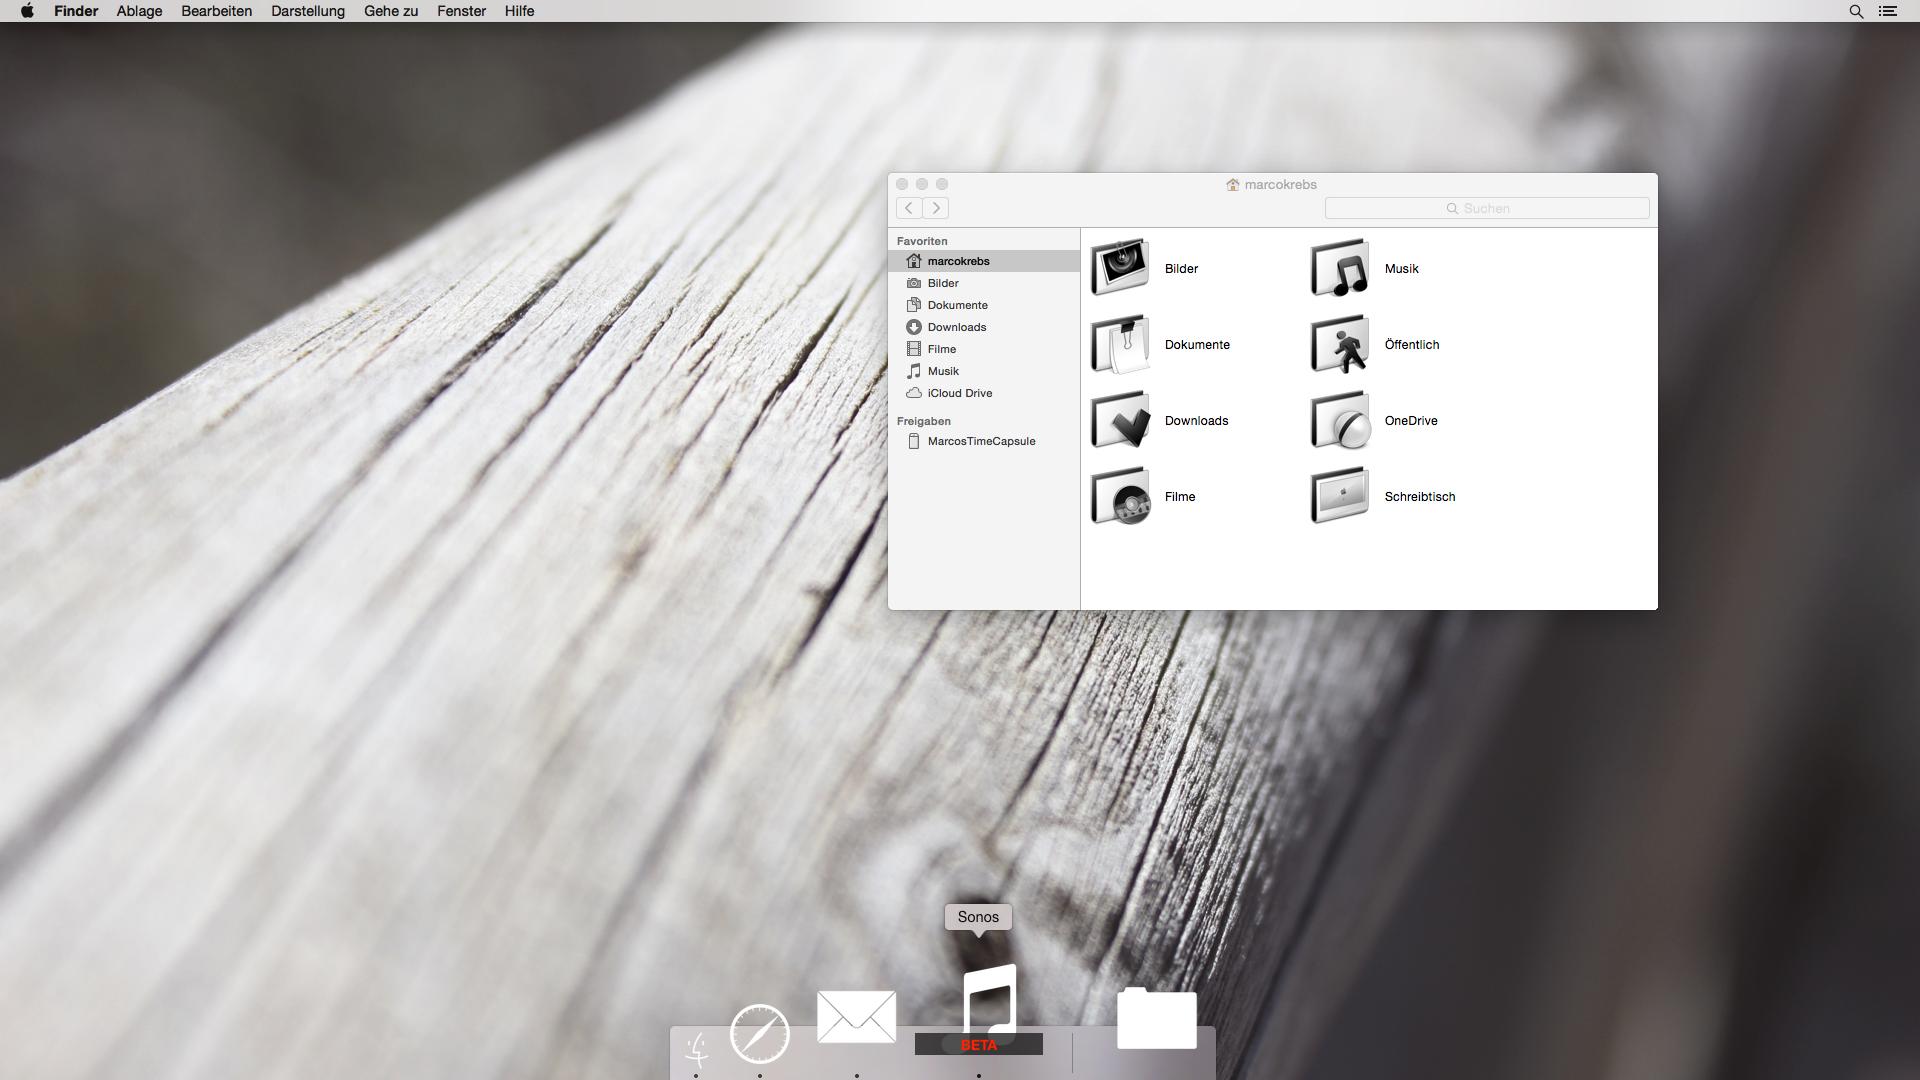 Bildschirmfoto 2014-10-03 um 22.25.47 by mutze